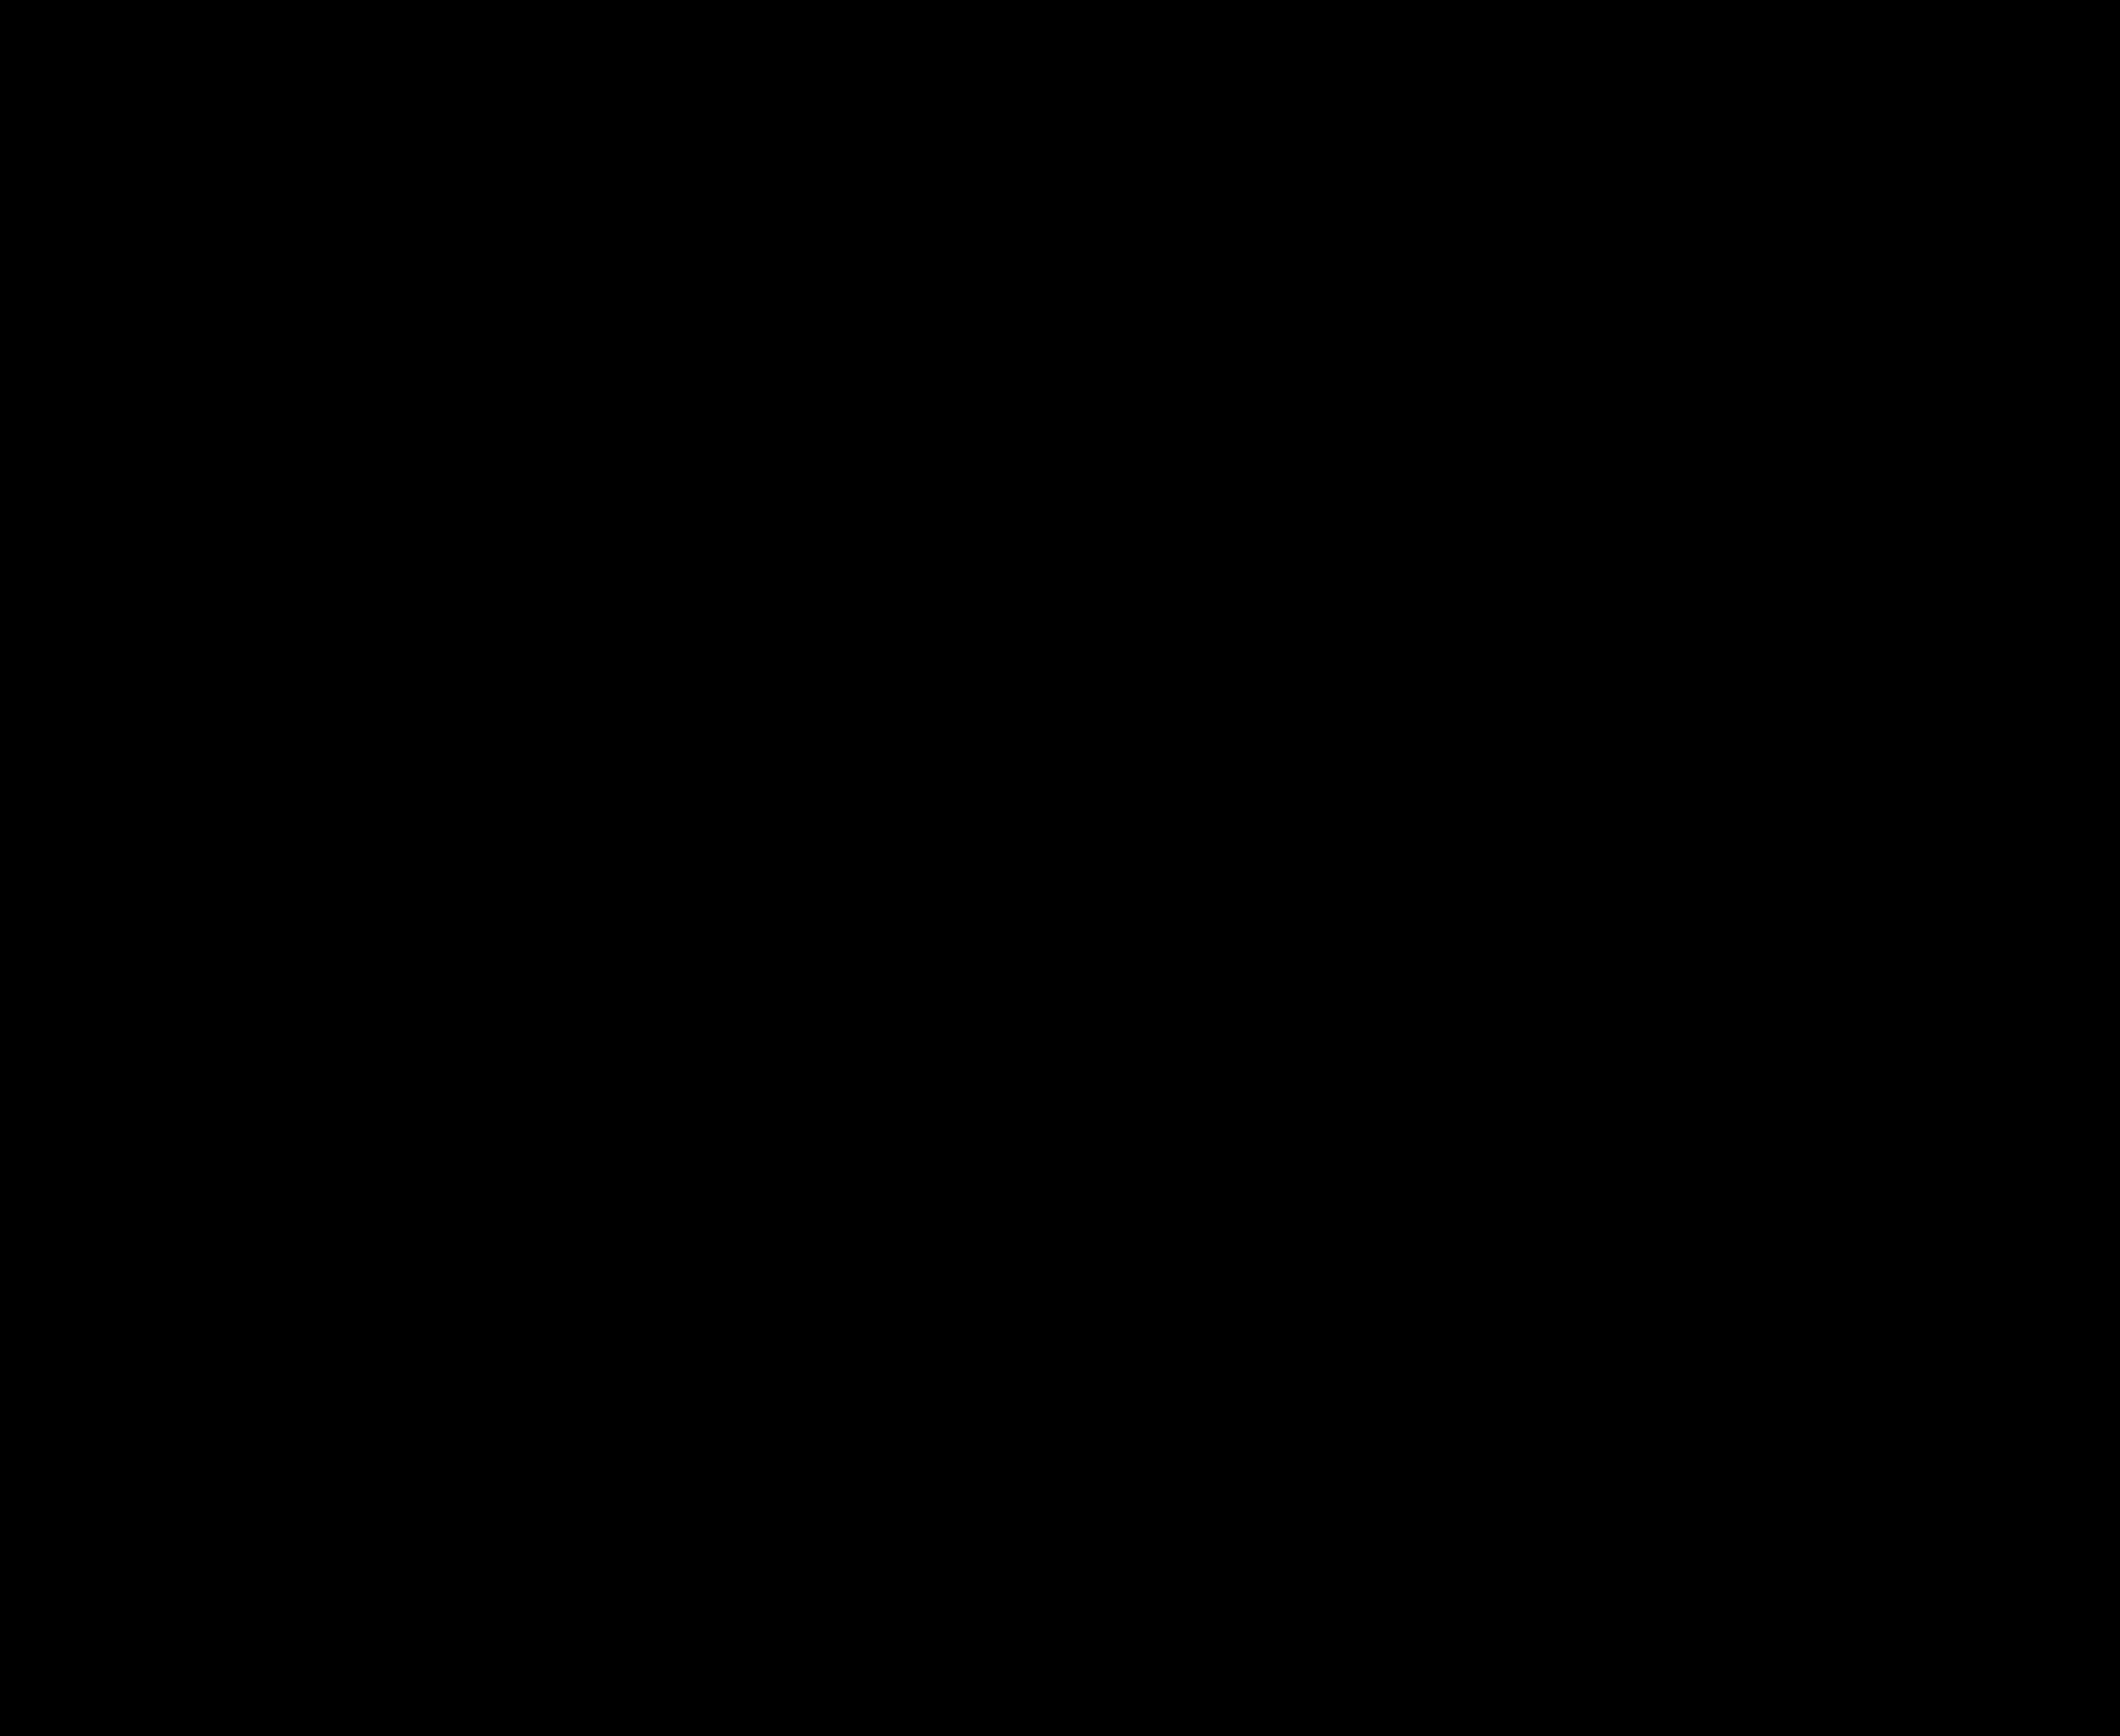 MediaMKRS_Logo_Black.png